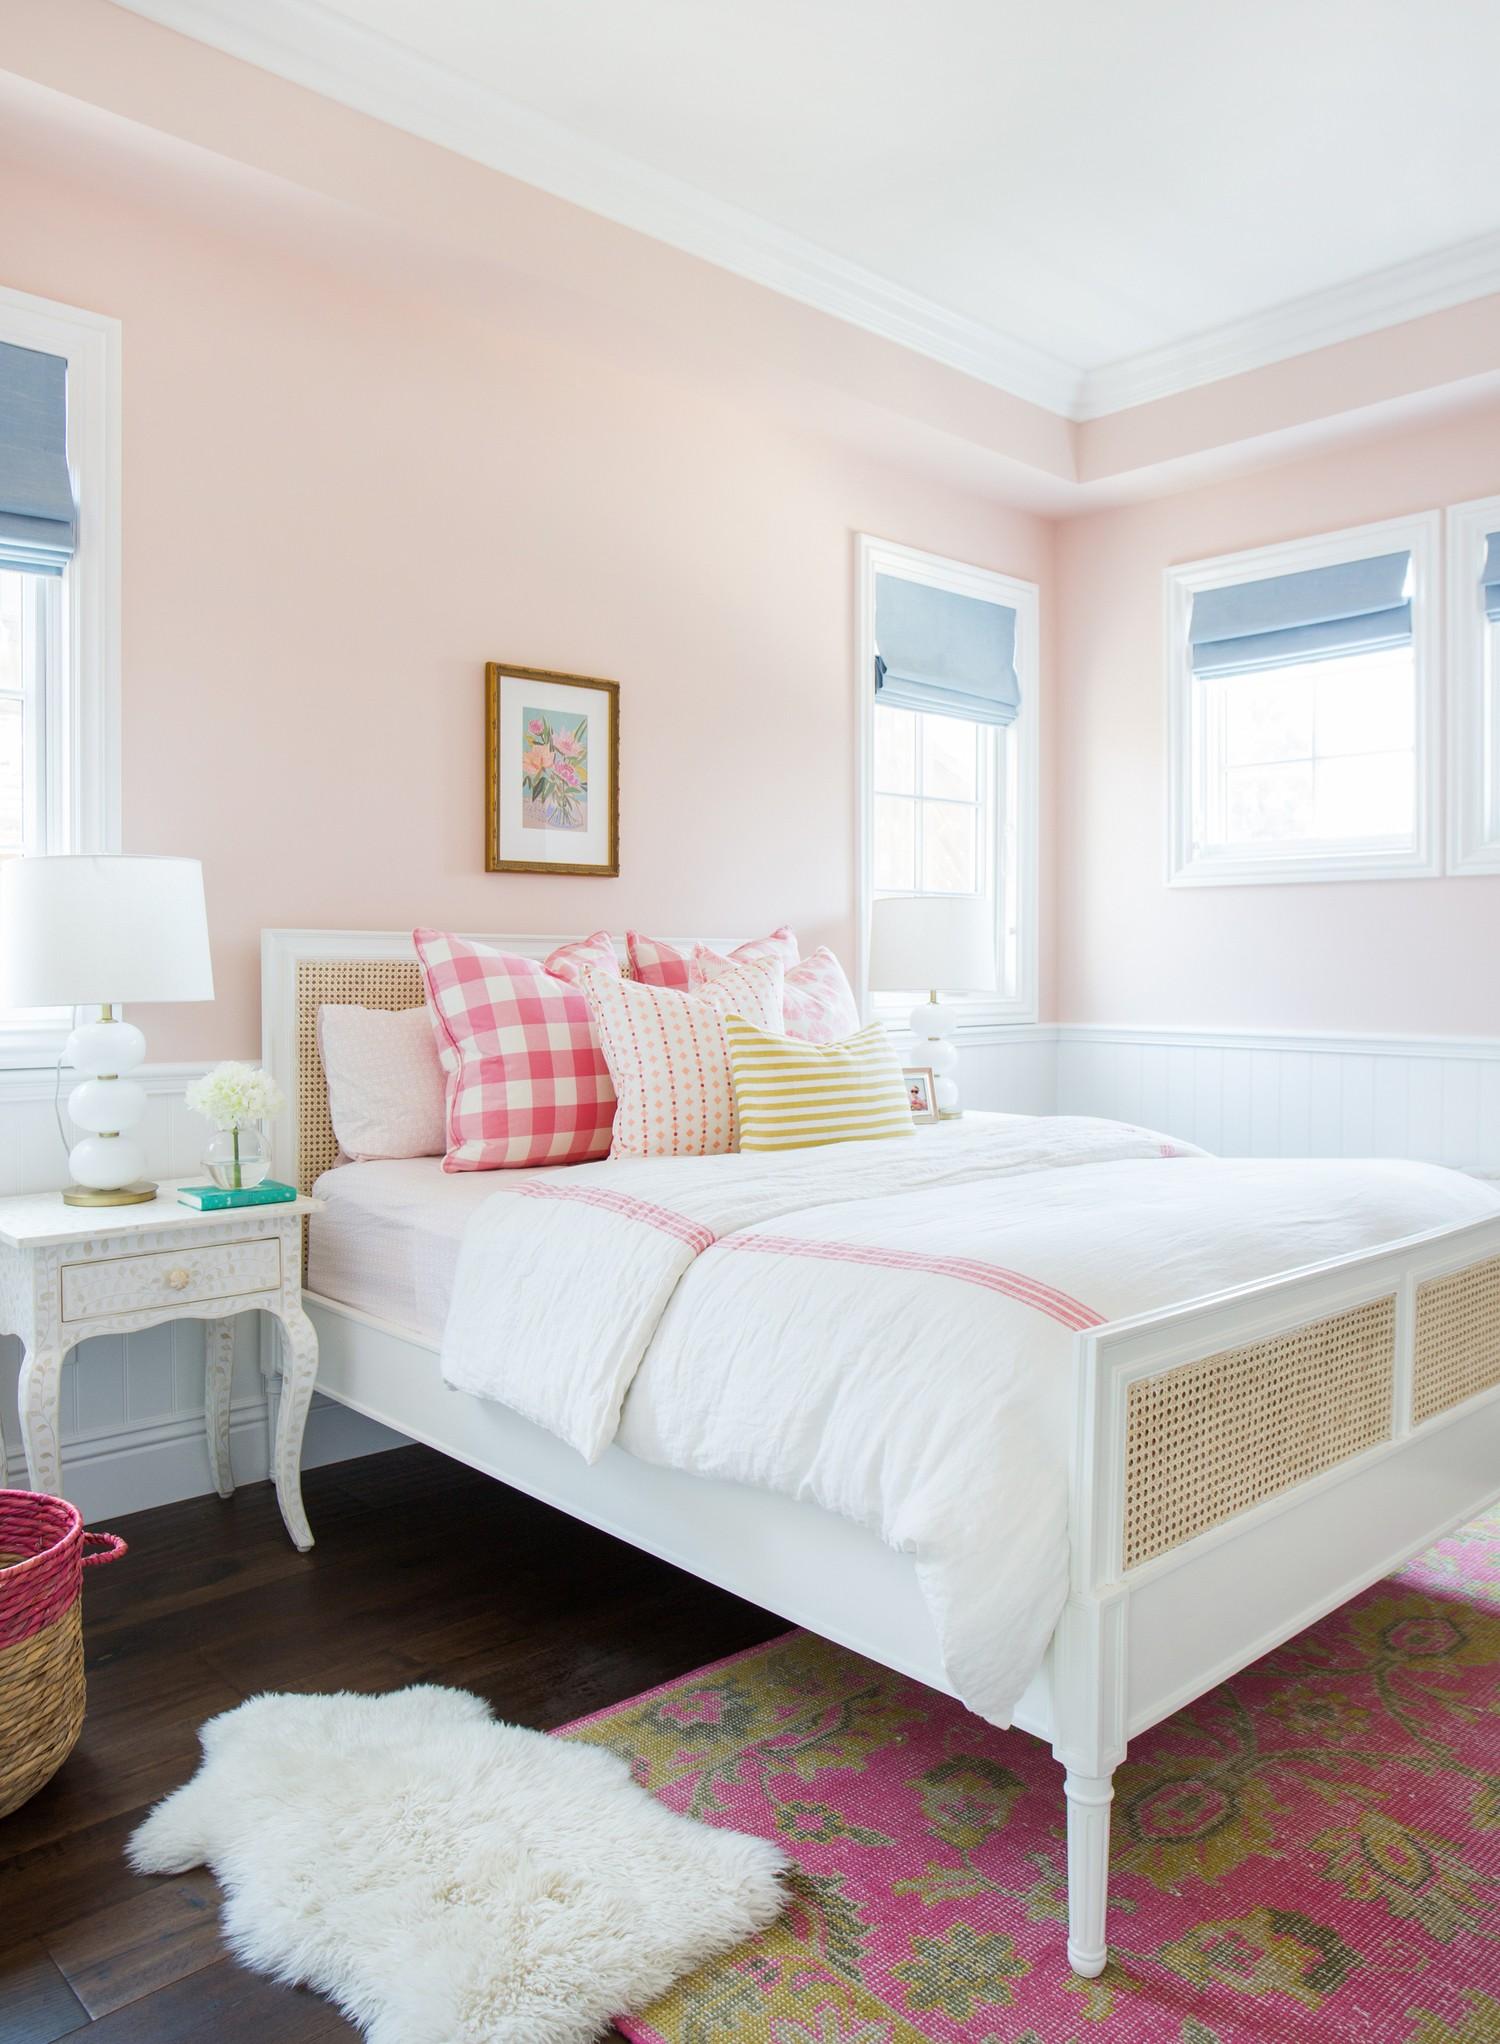 Little+Girl's+Room+painted+Benjamin+Moore+_Love+&+Happiness_+__+Studio+McGee.jpg